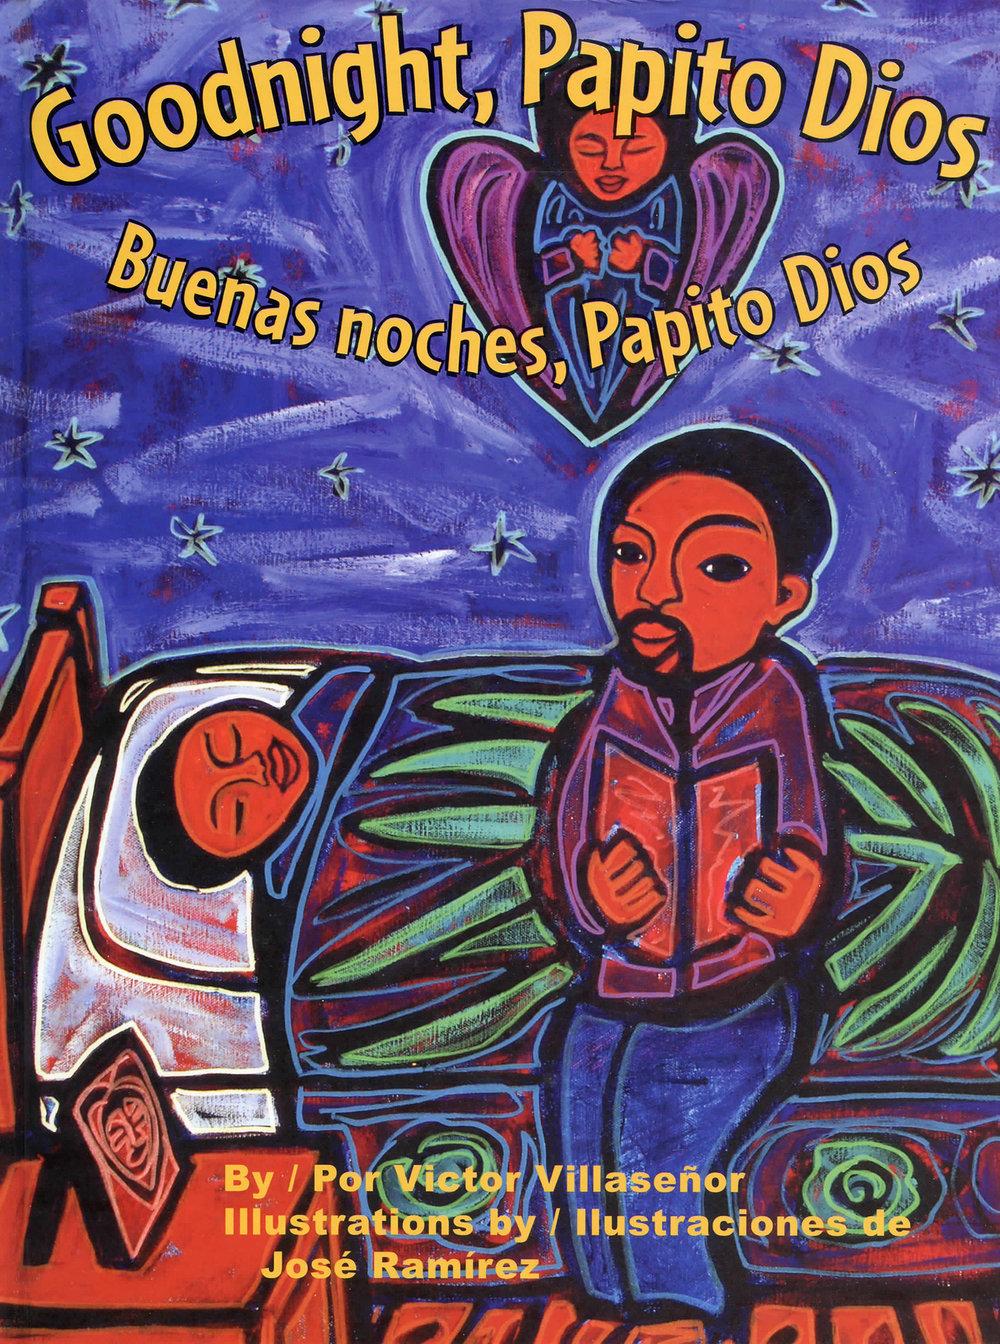 goodnight, papito dios, 2007.jpg